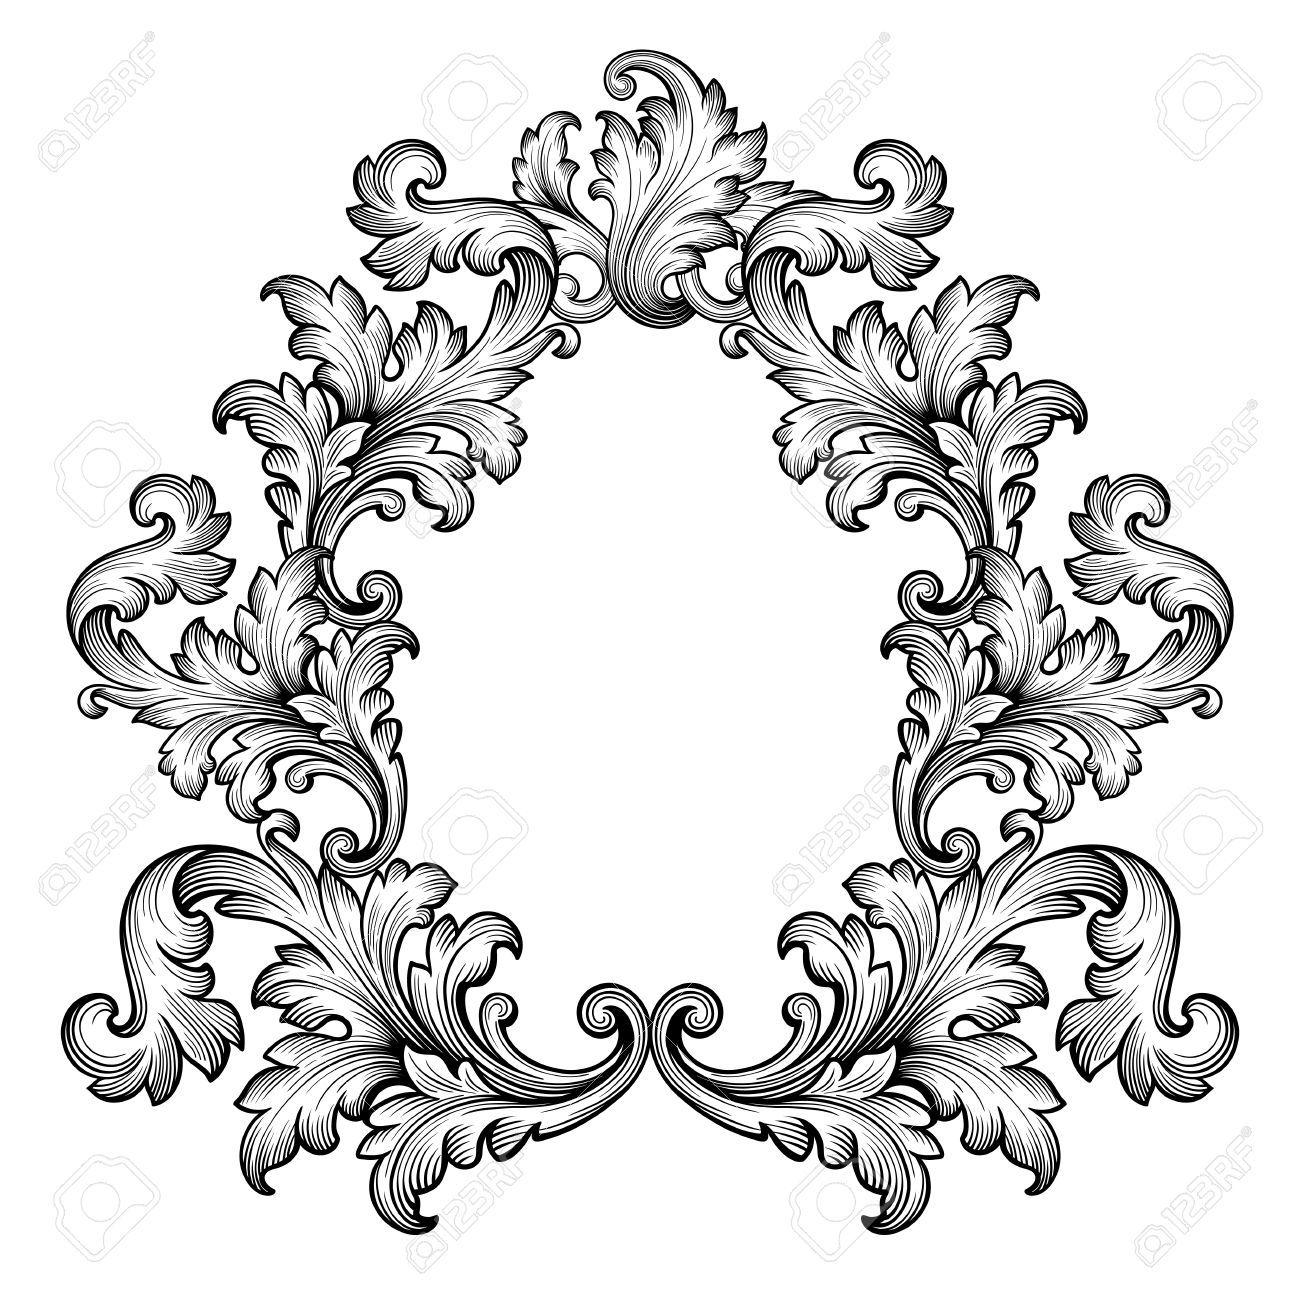 Antique Scroll Vector: Vintage Baroque Frame Scroll Ornament Engraving Border